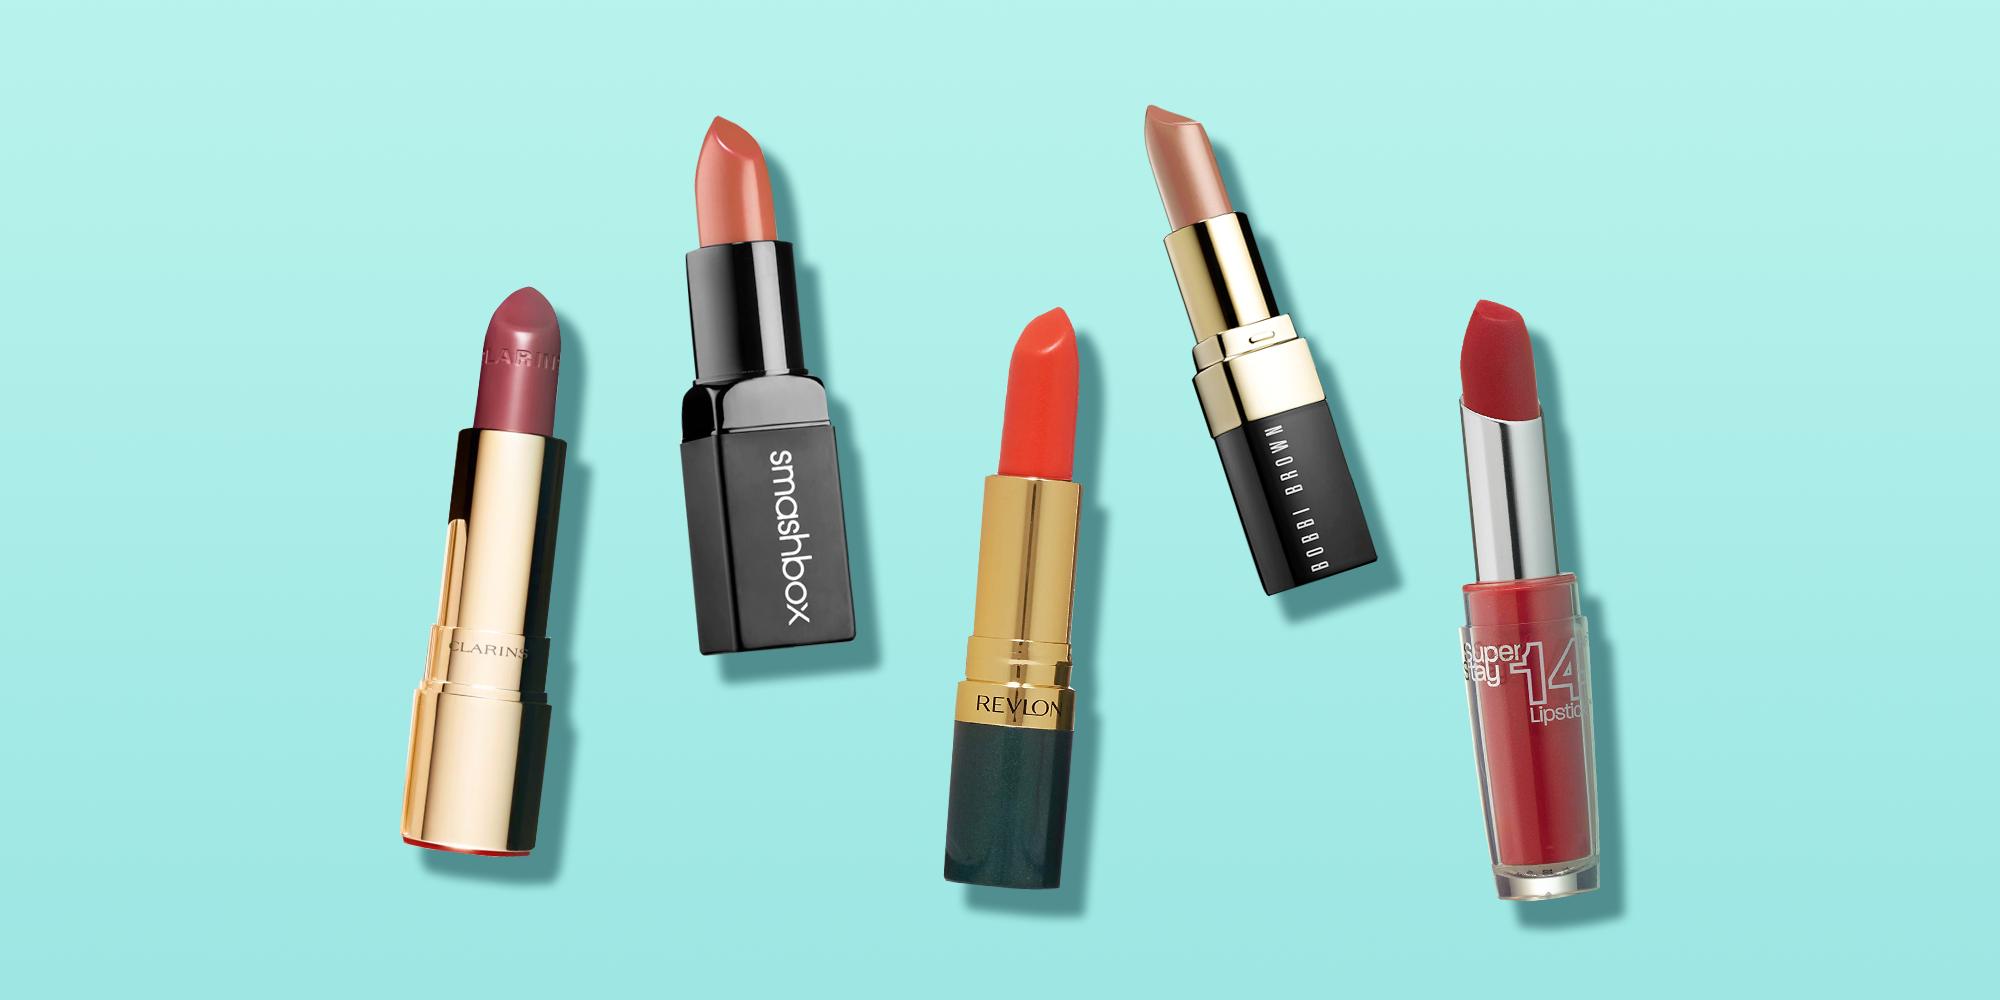 6 Best Lead Free Lipsticks Of 2020 Safest Non Toxic Lipstick Brands